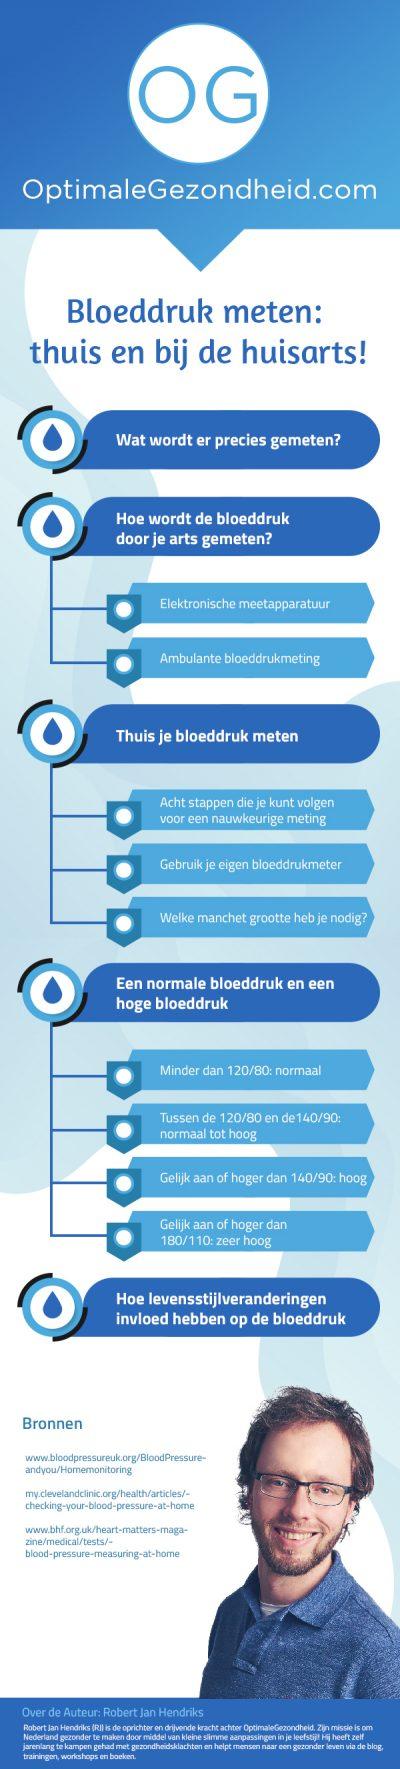 bloeddruk meten thuis infografiek